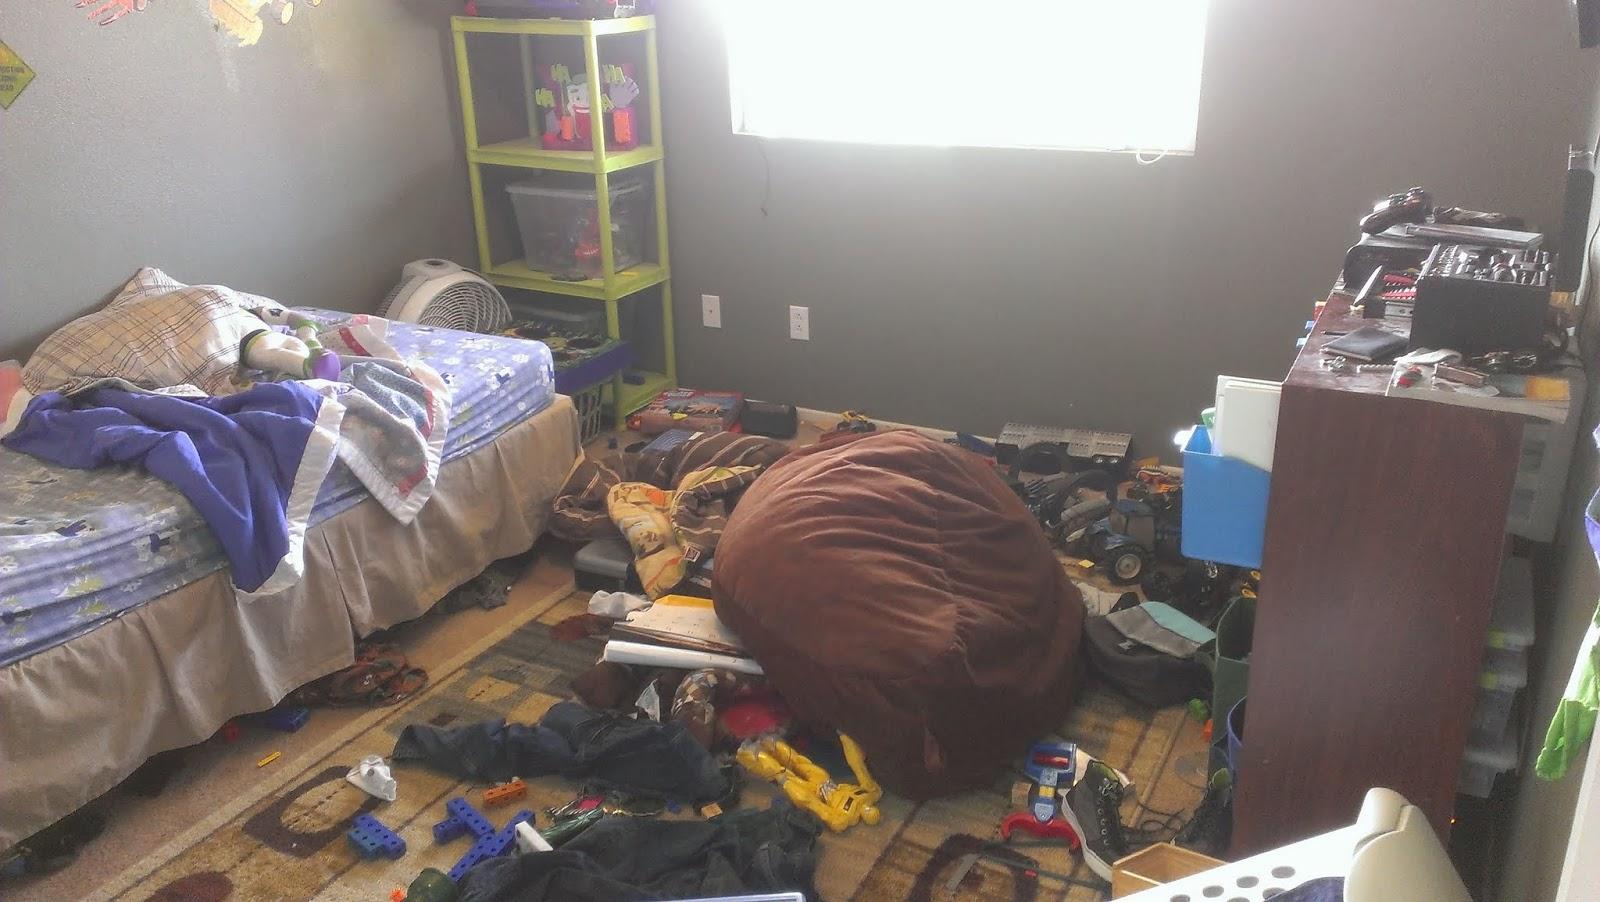 Reorganizing Room: BRYCE'S ROOM REORGANIZATION